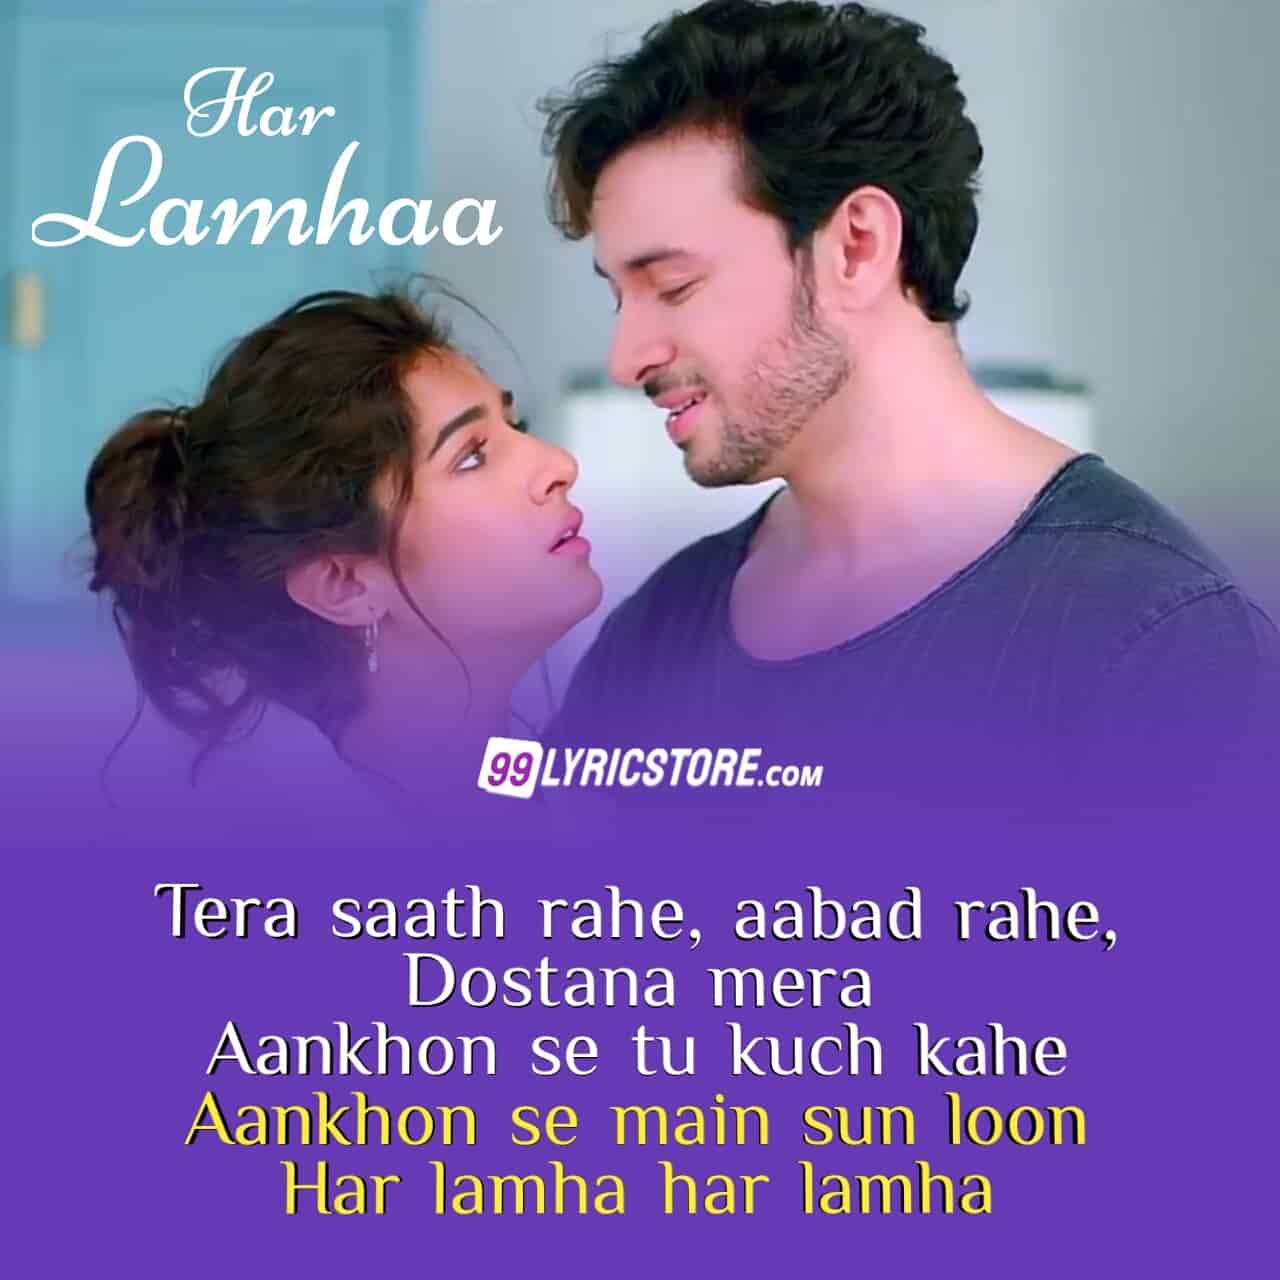 Har Lamhaa Lyrics sung by Papon